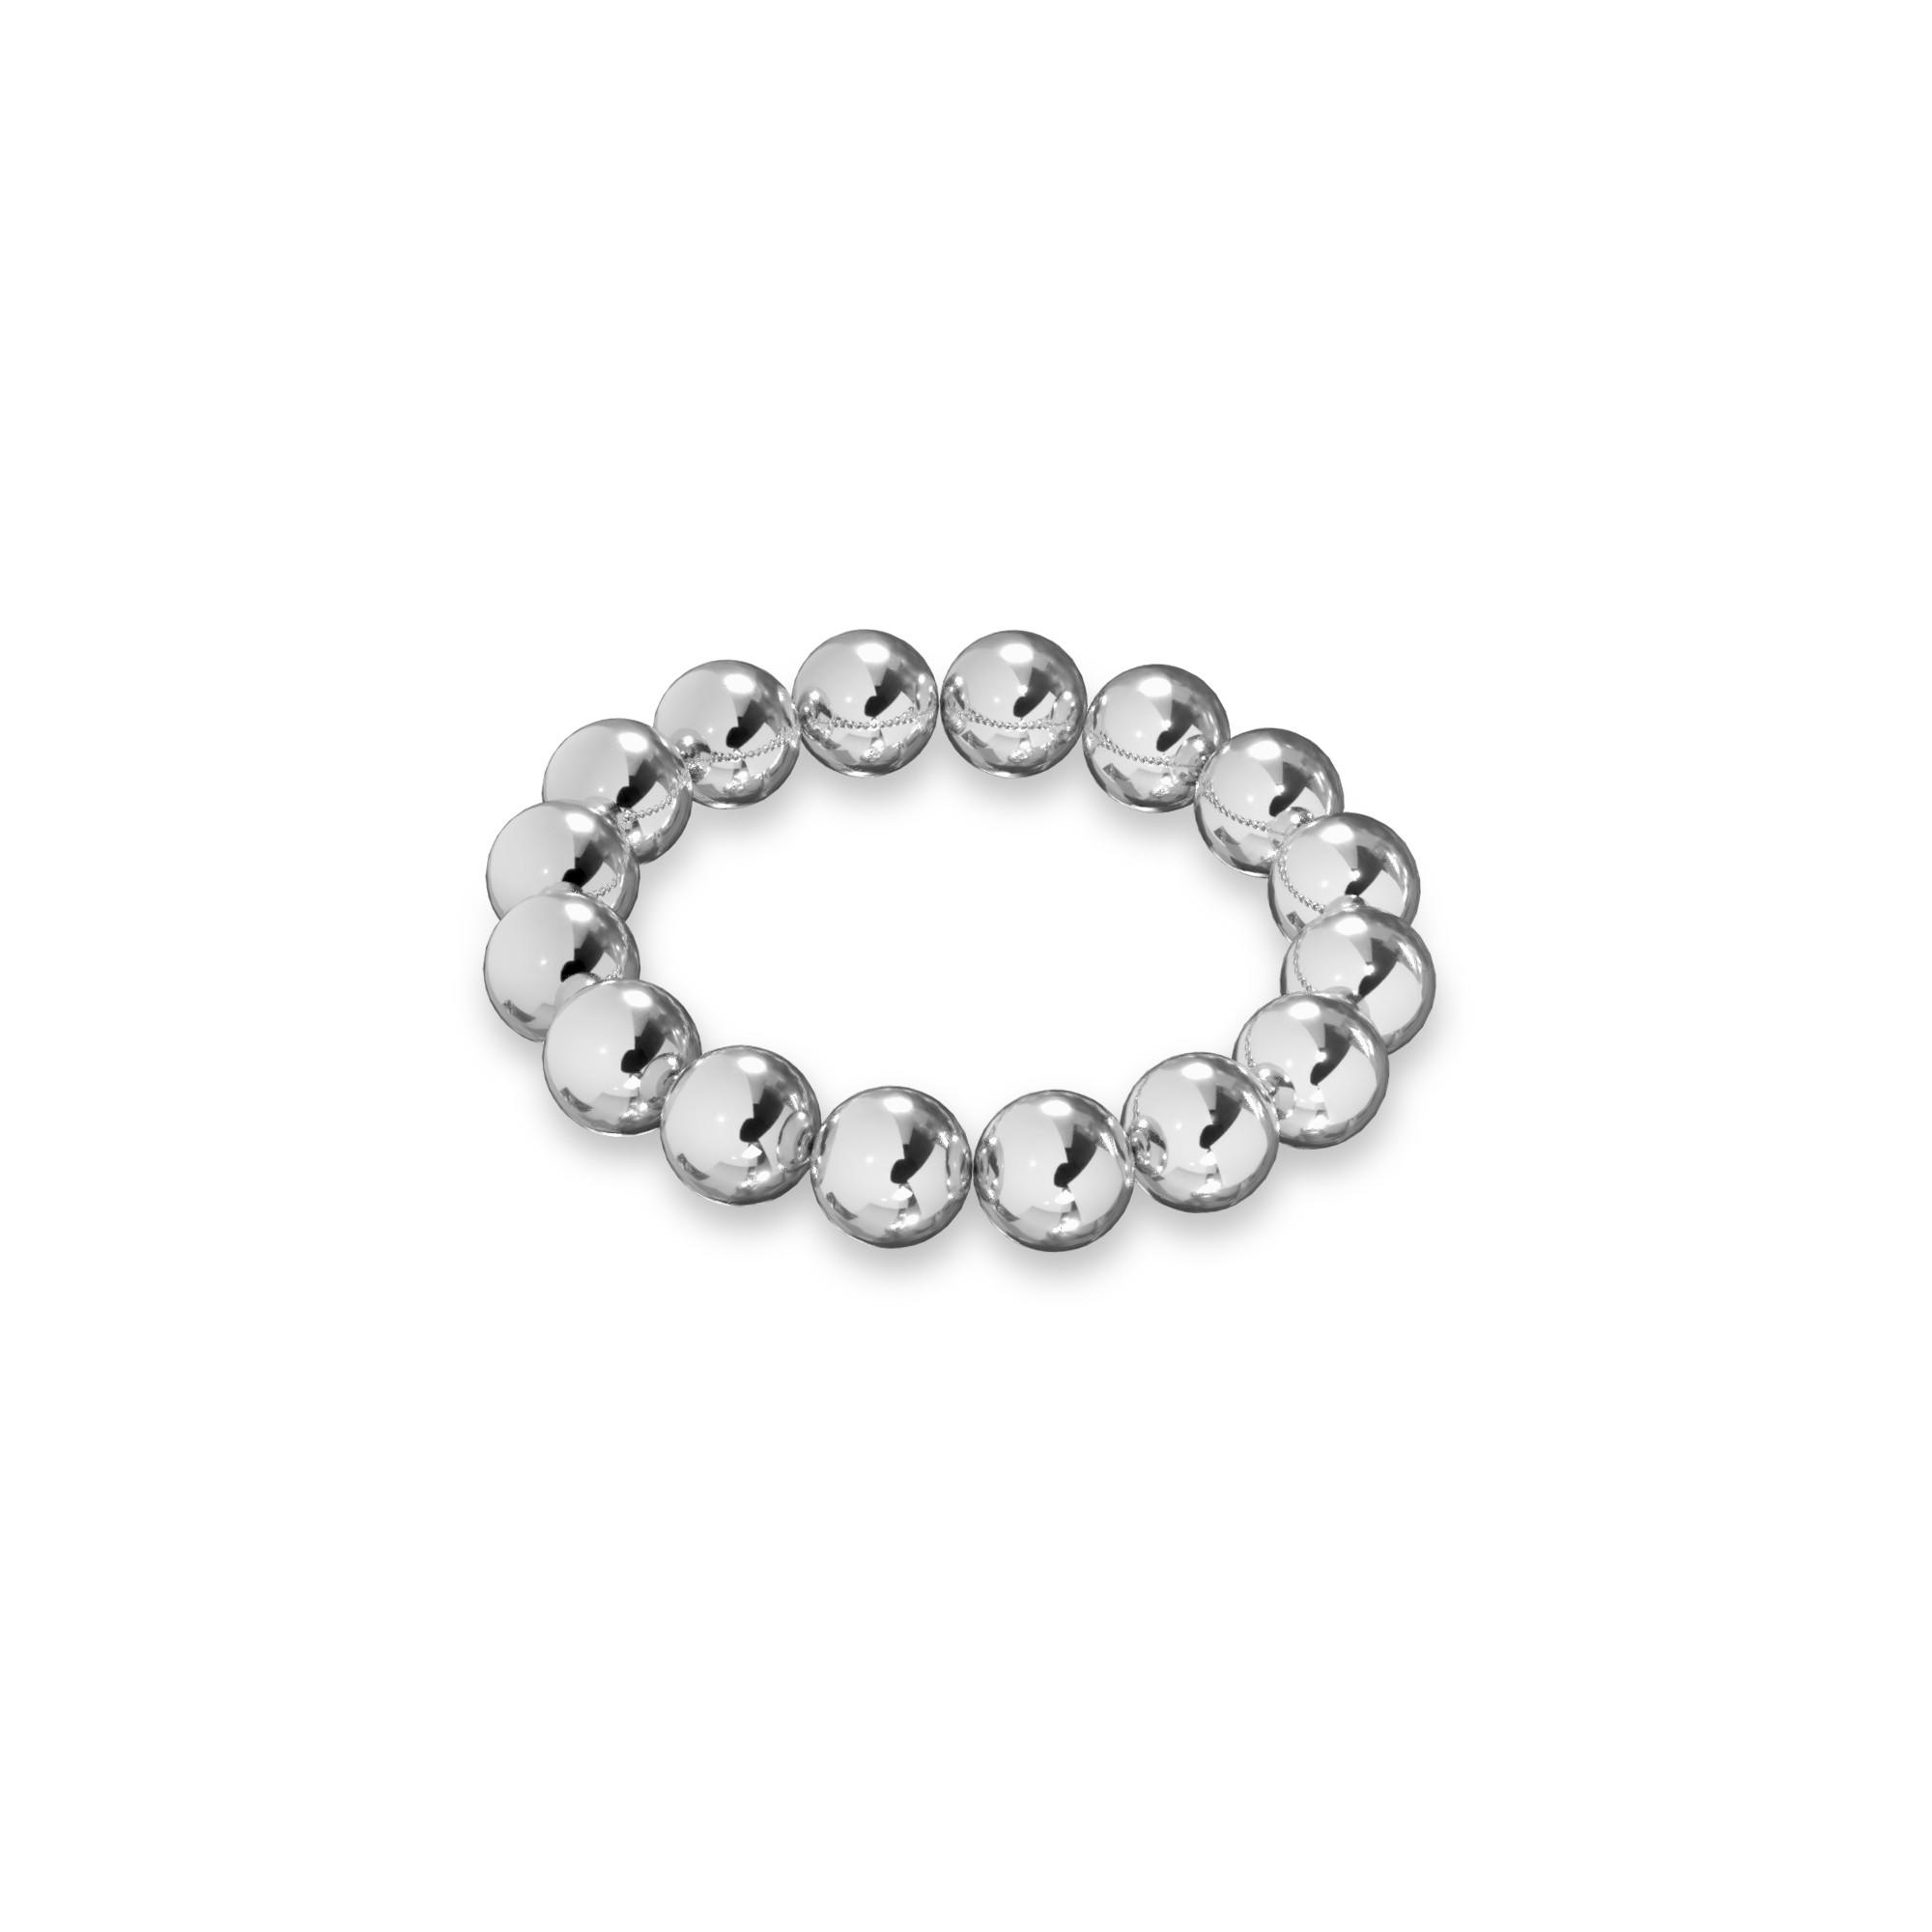 Flexible balls ring sterling silver 925